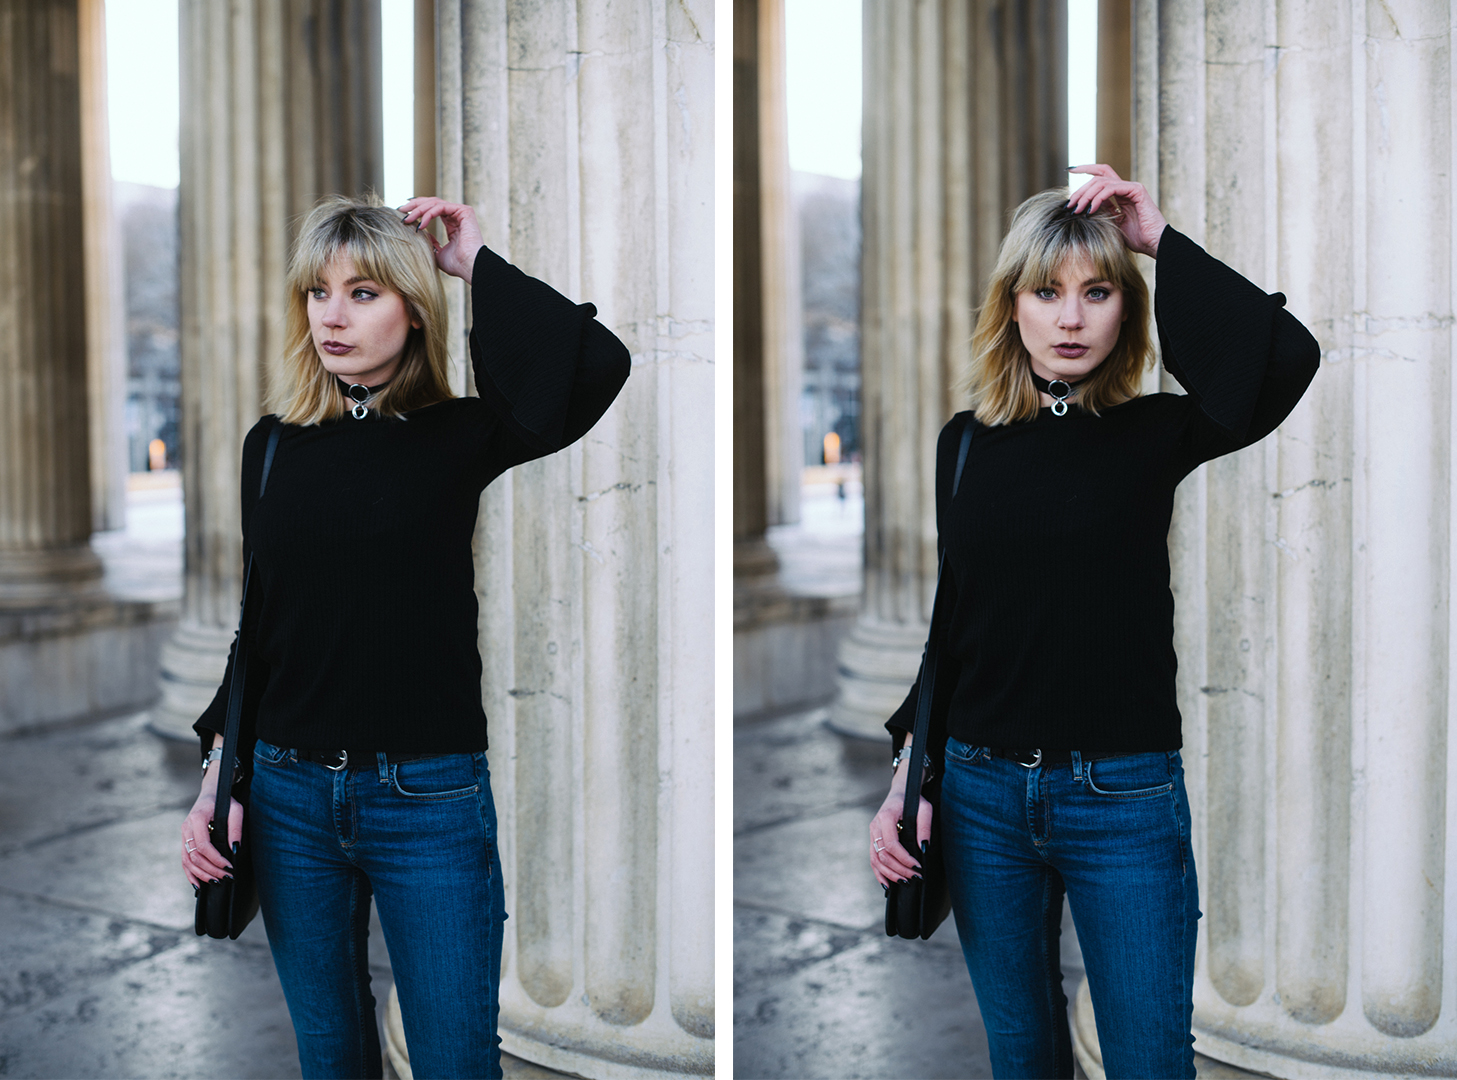 Kiamisu_Modeblog_Fashionblog_Beautyblog_Leo Mantel_Zara_Leo Mantel kombinieren-collage2